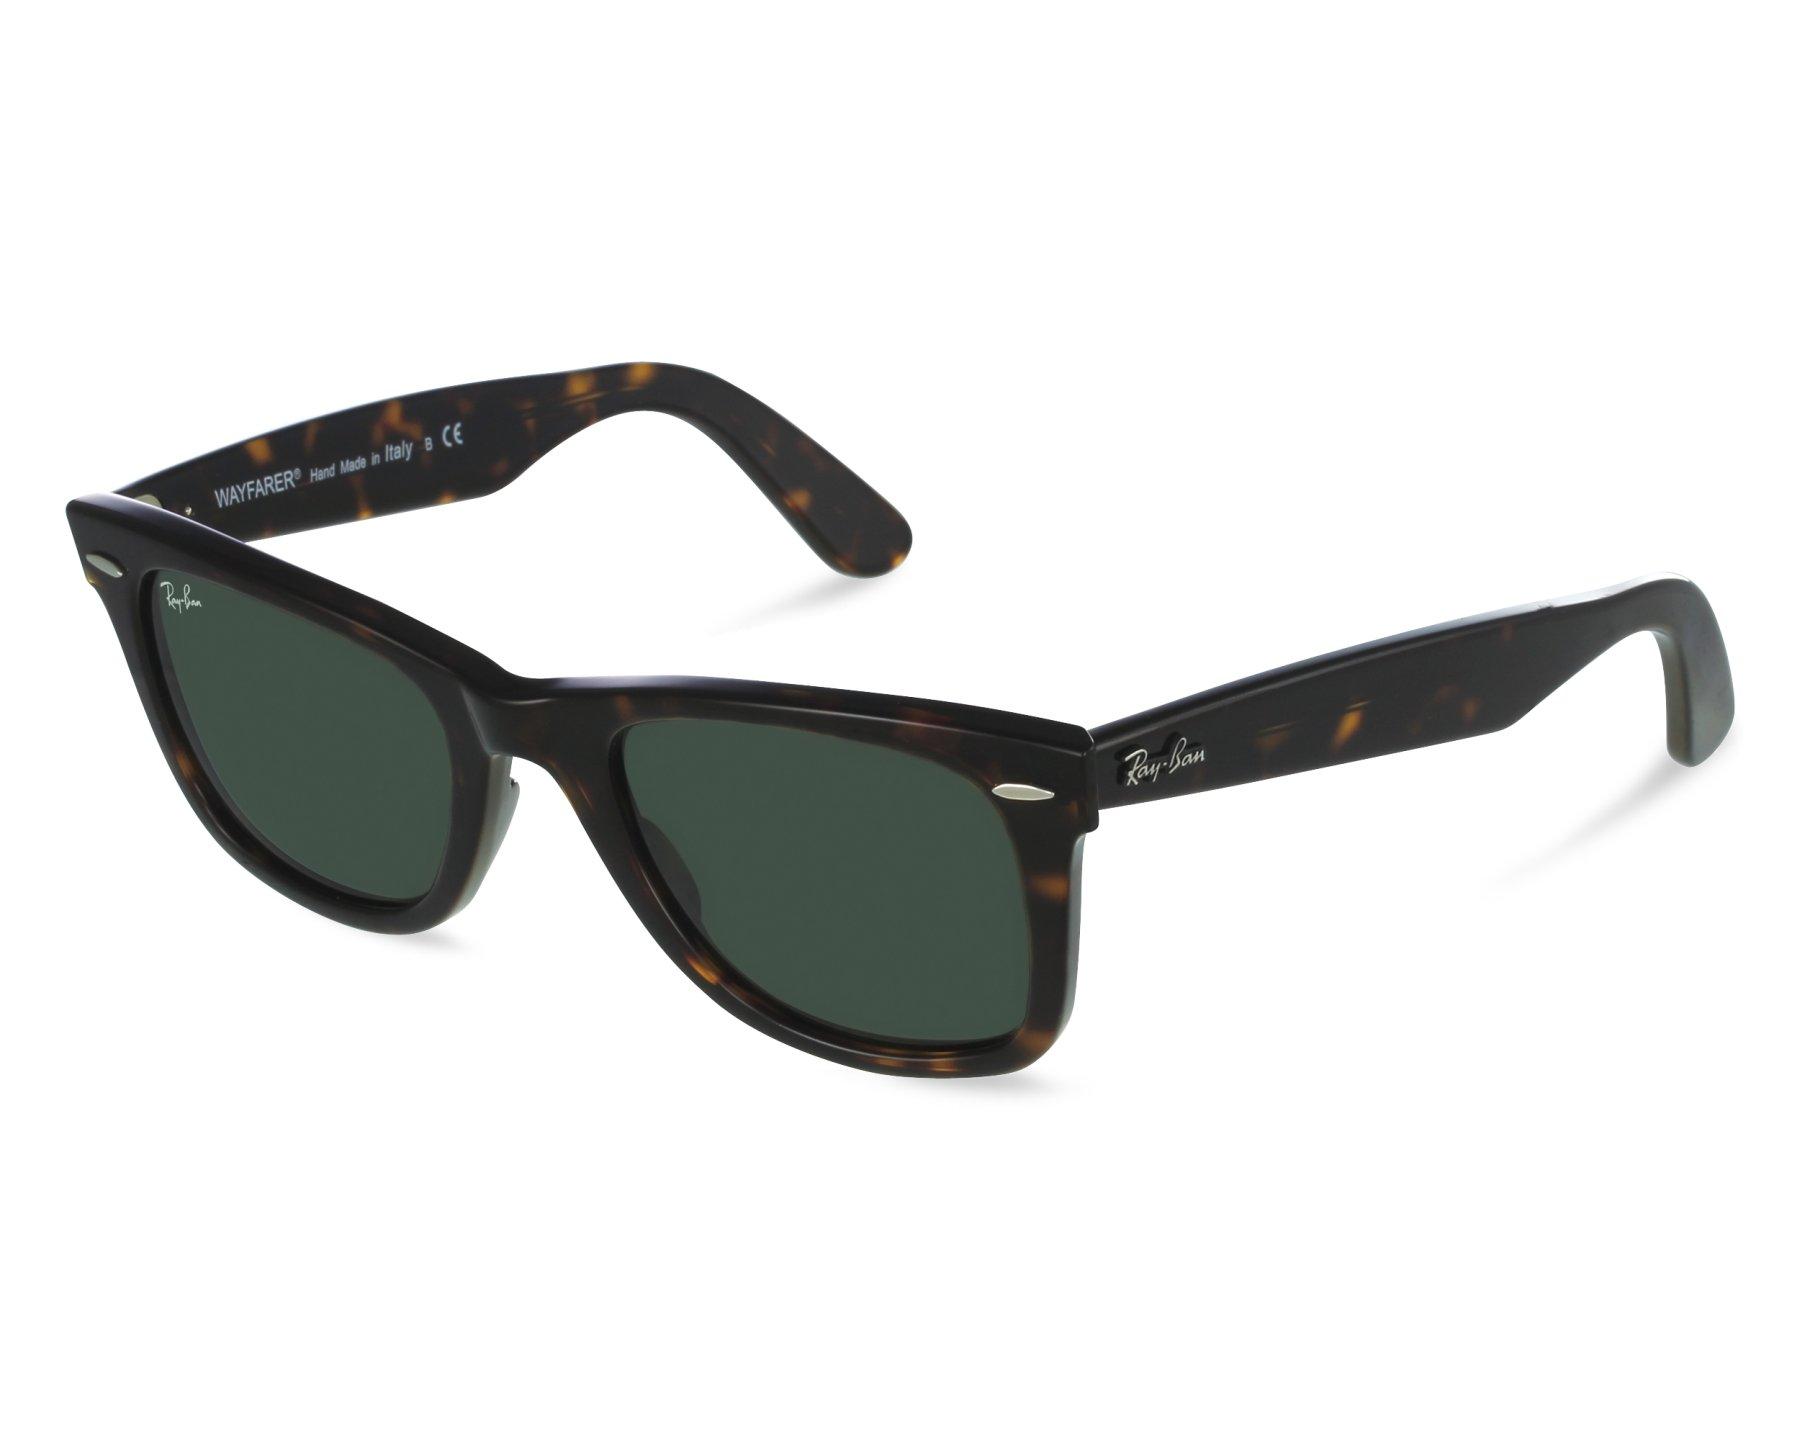 37fda9bc0b6 Sunglasses Ray-Ban RB-2140 902 50-22 Brown front view